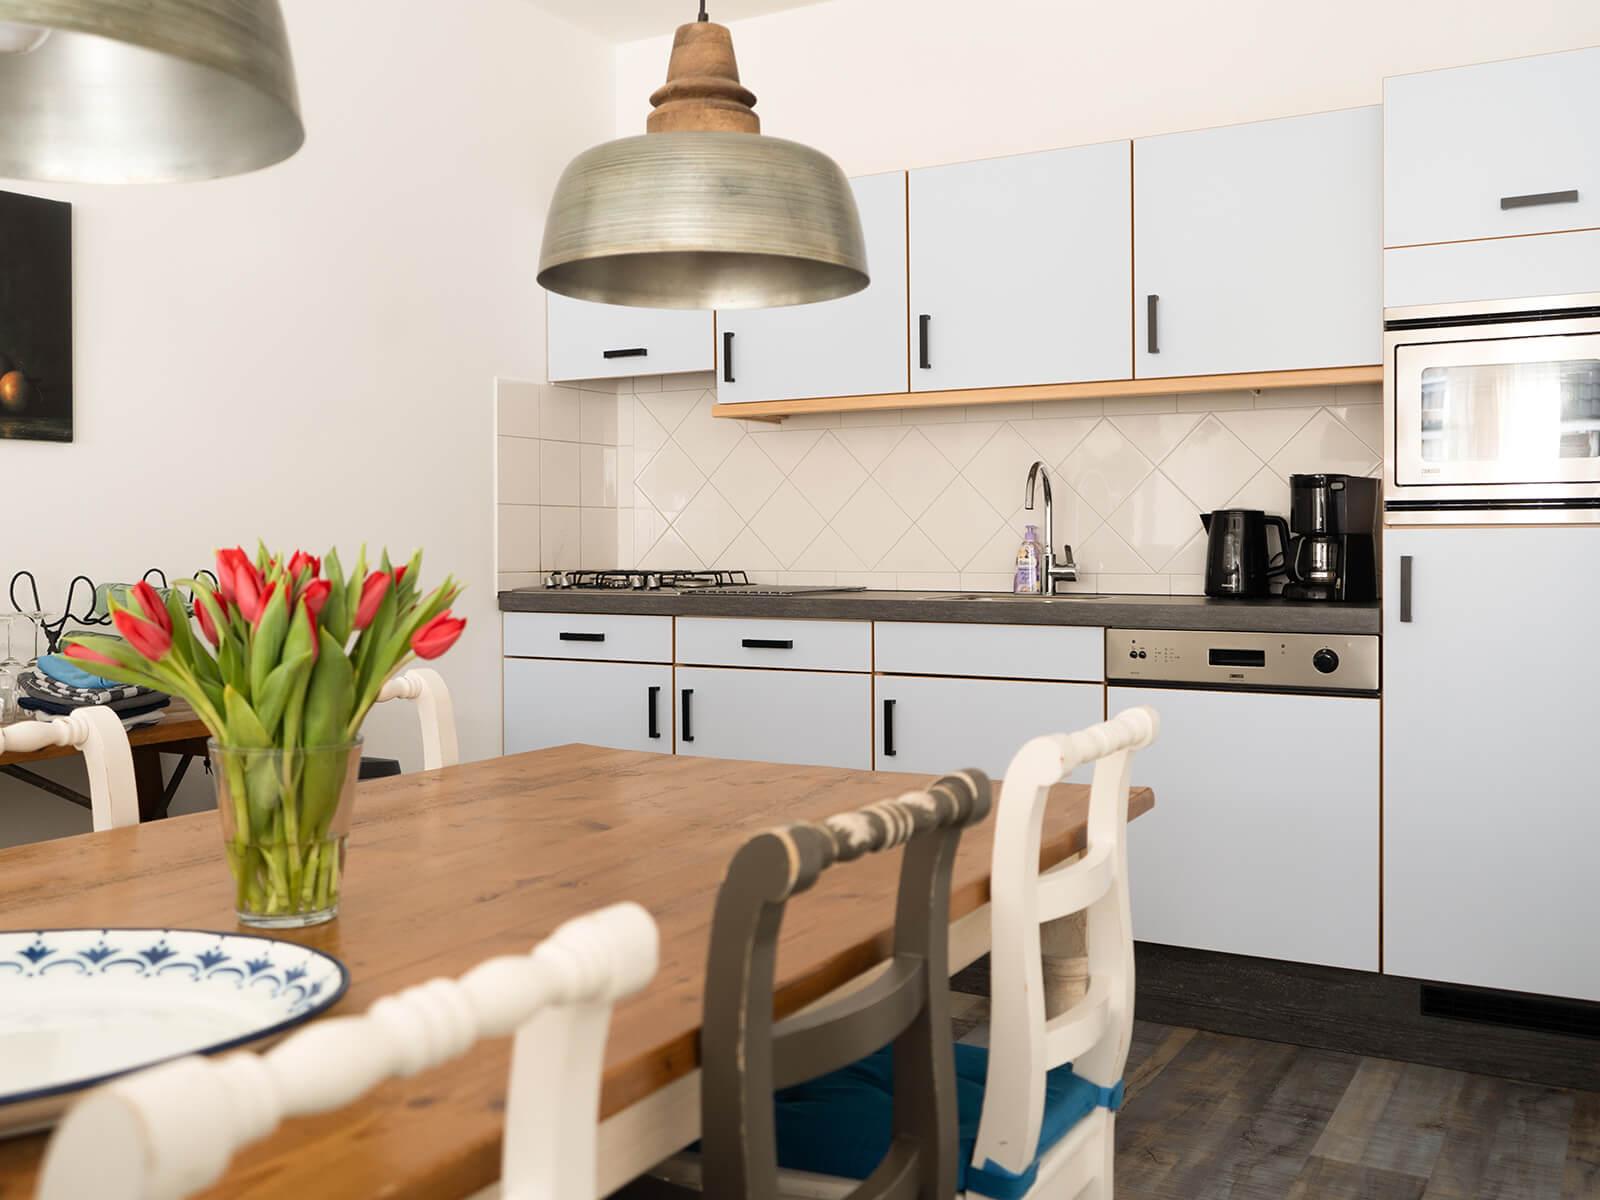 keuken_1-2